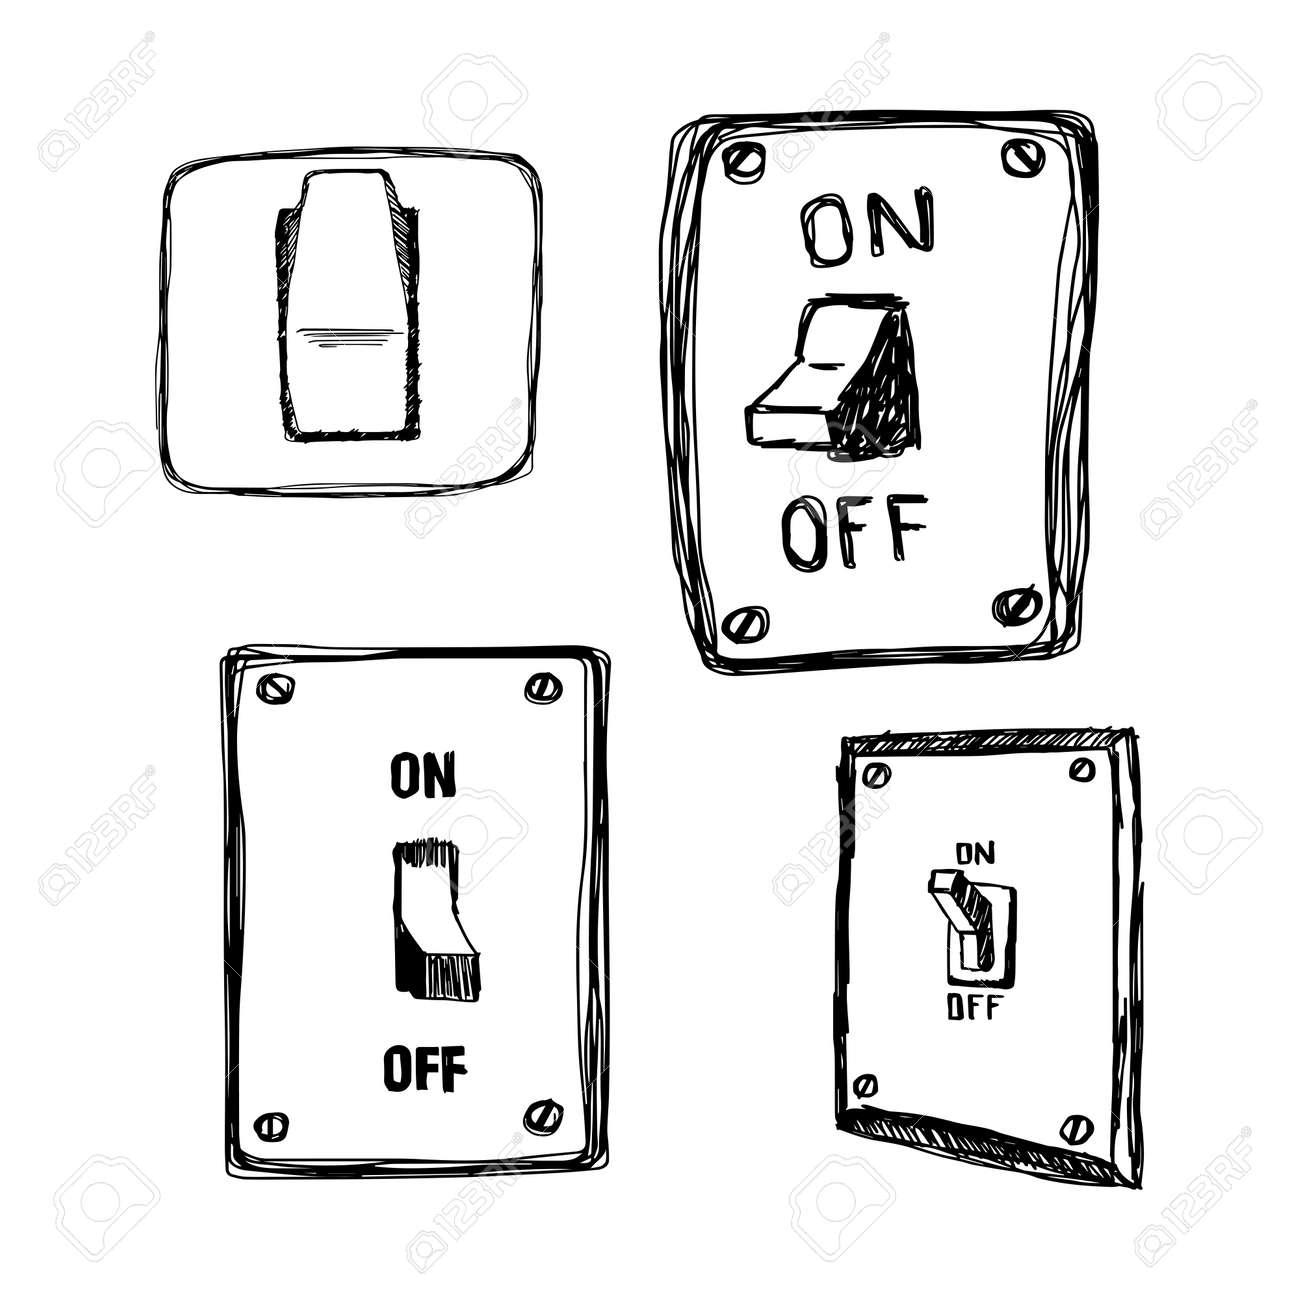 Illustration vector hand drawn doodles single wall light switch illustration vector hand drawn doodles single wall light switch stock vector 40672713 sciox Gallery